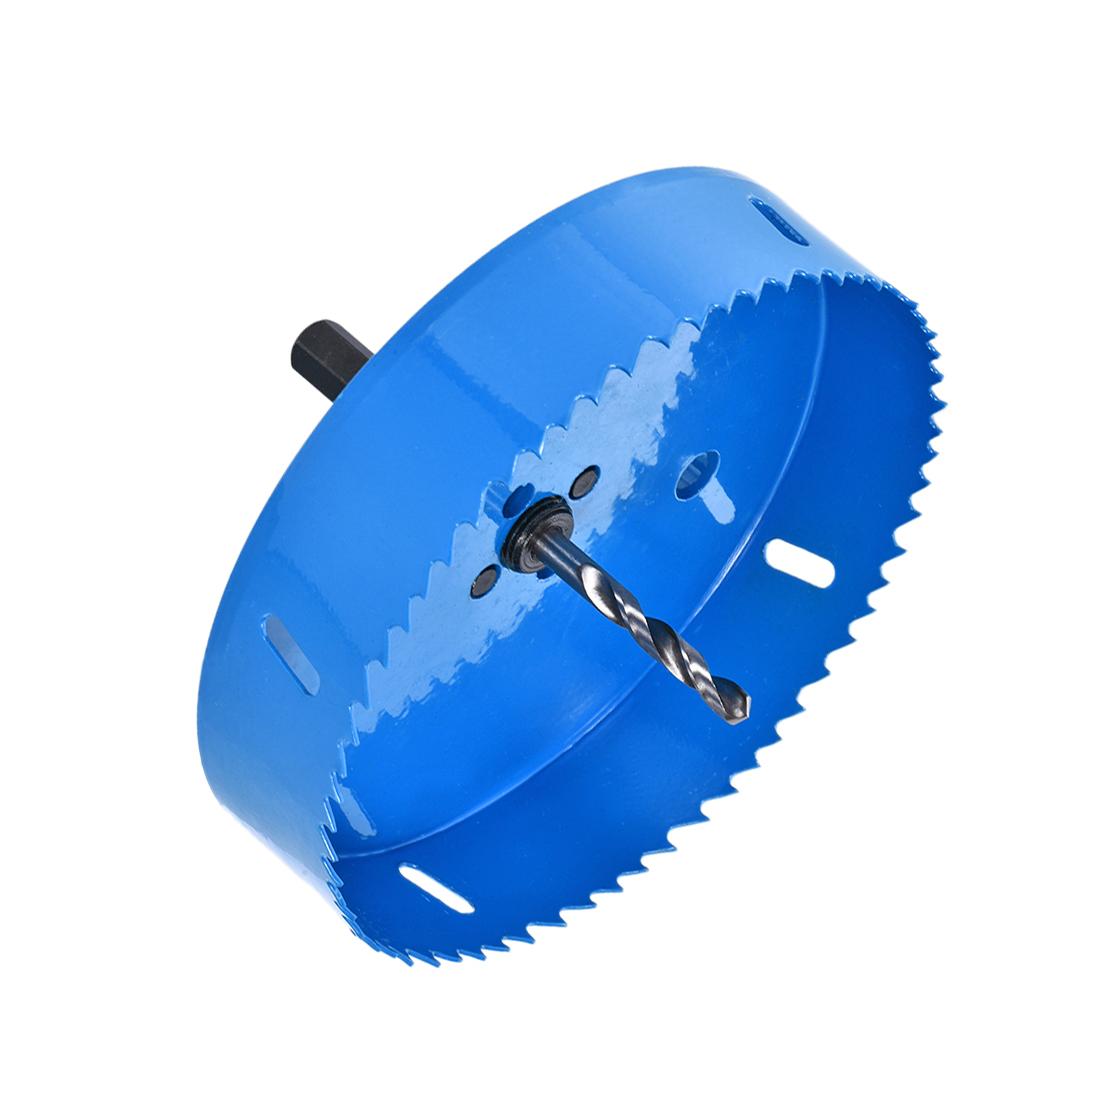 5 29/32 Inch Bi-Metal Hole Saw for Cornhole Boards Corn Hole Drilling Cutter